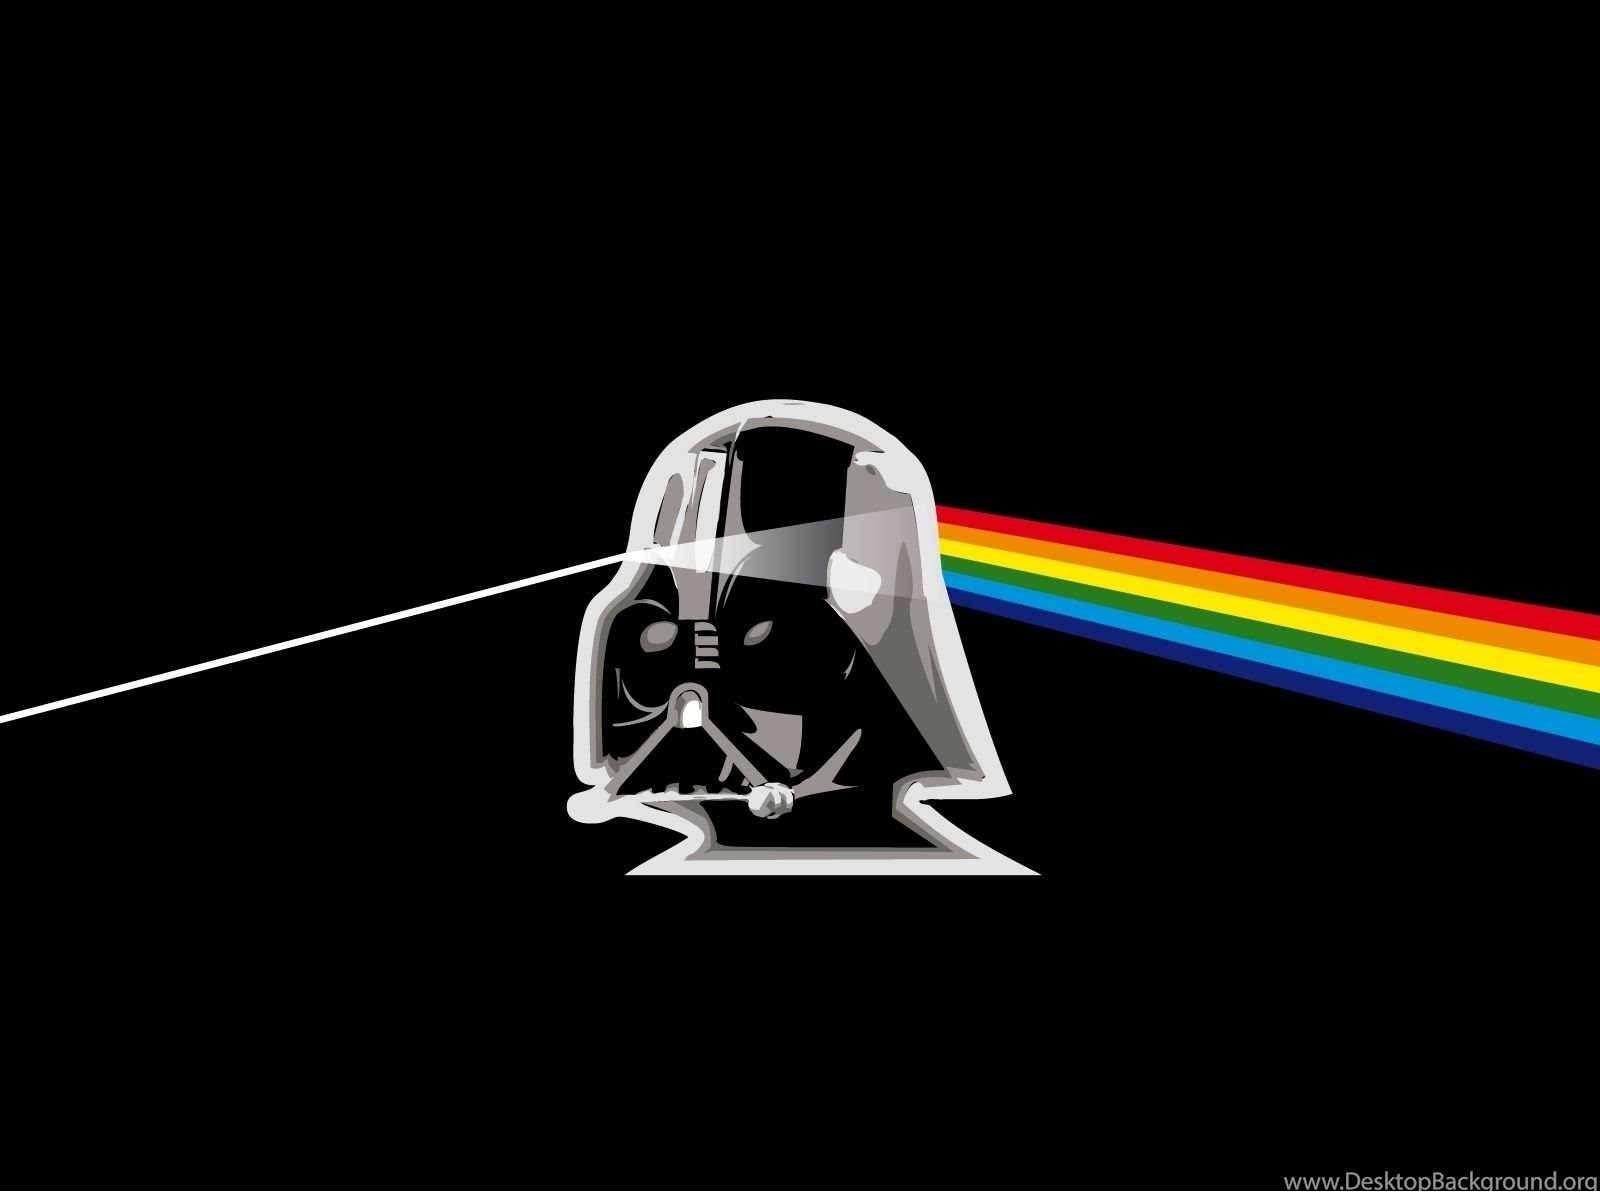 Funny Star Wars Wallpapers Wallpapers Cave Desktop Background